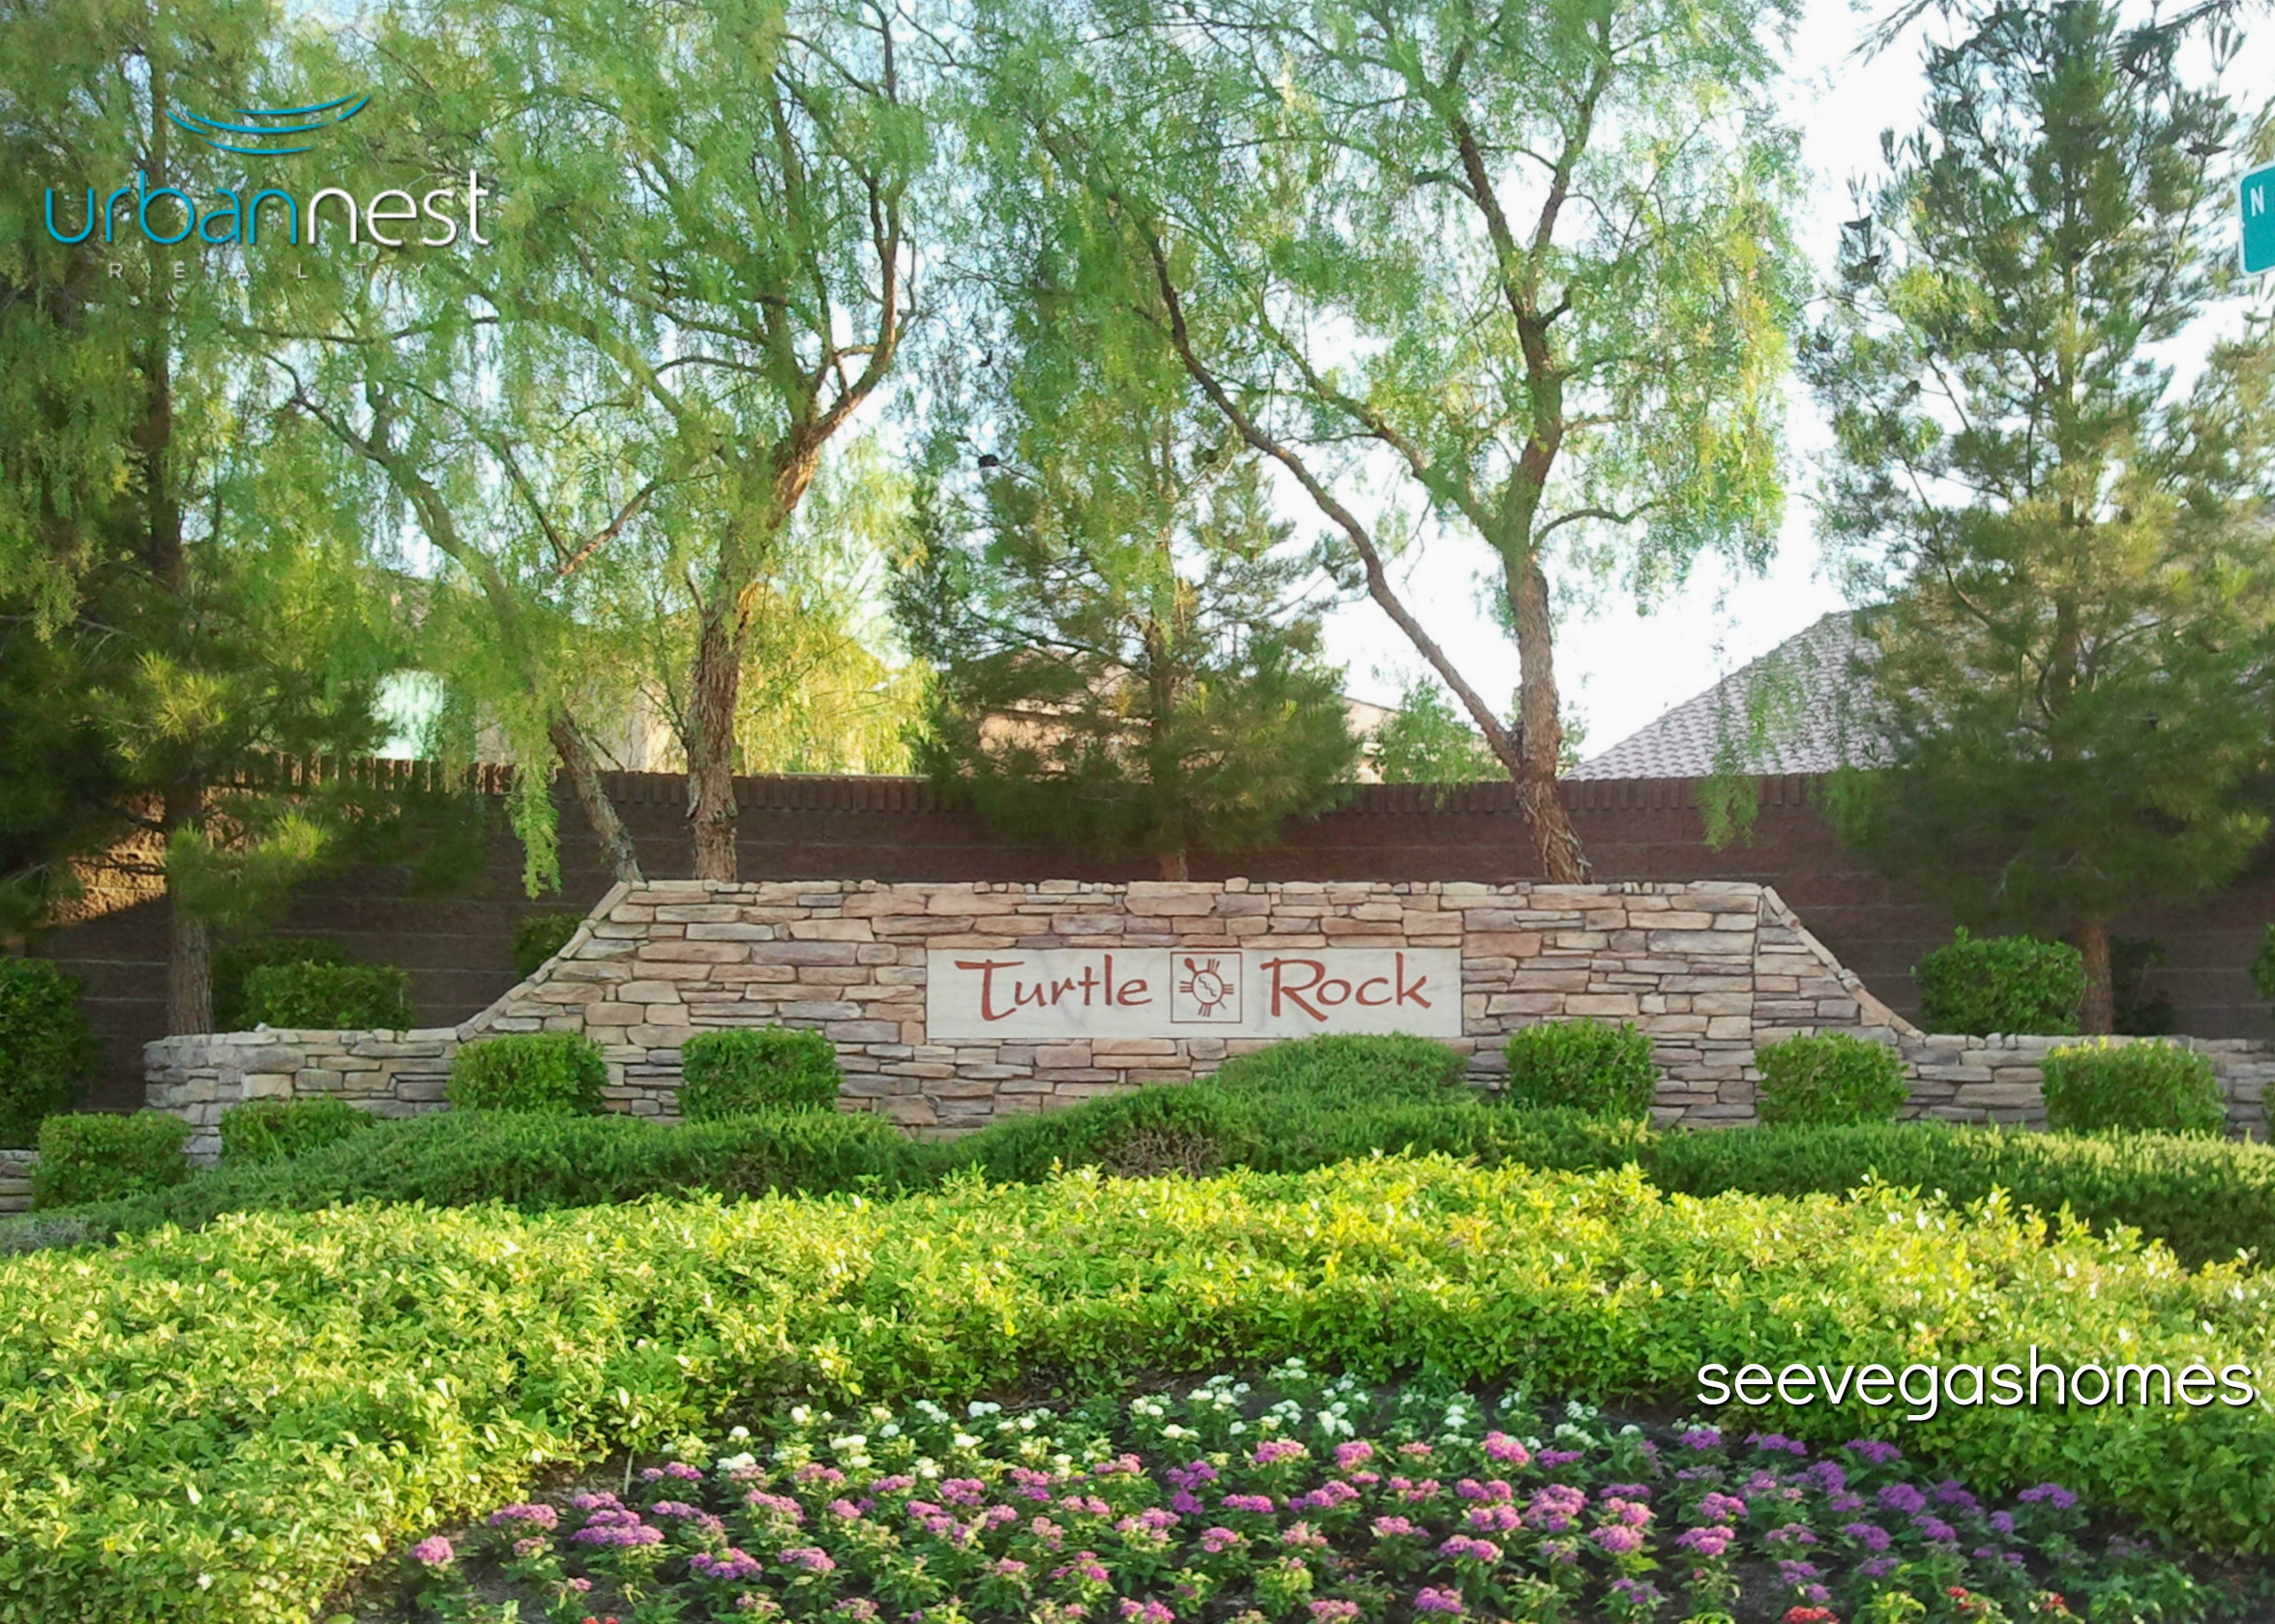 Turtle Rock Valley Crest 2 Las Vegas NV 89149 SeeVegasHomes